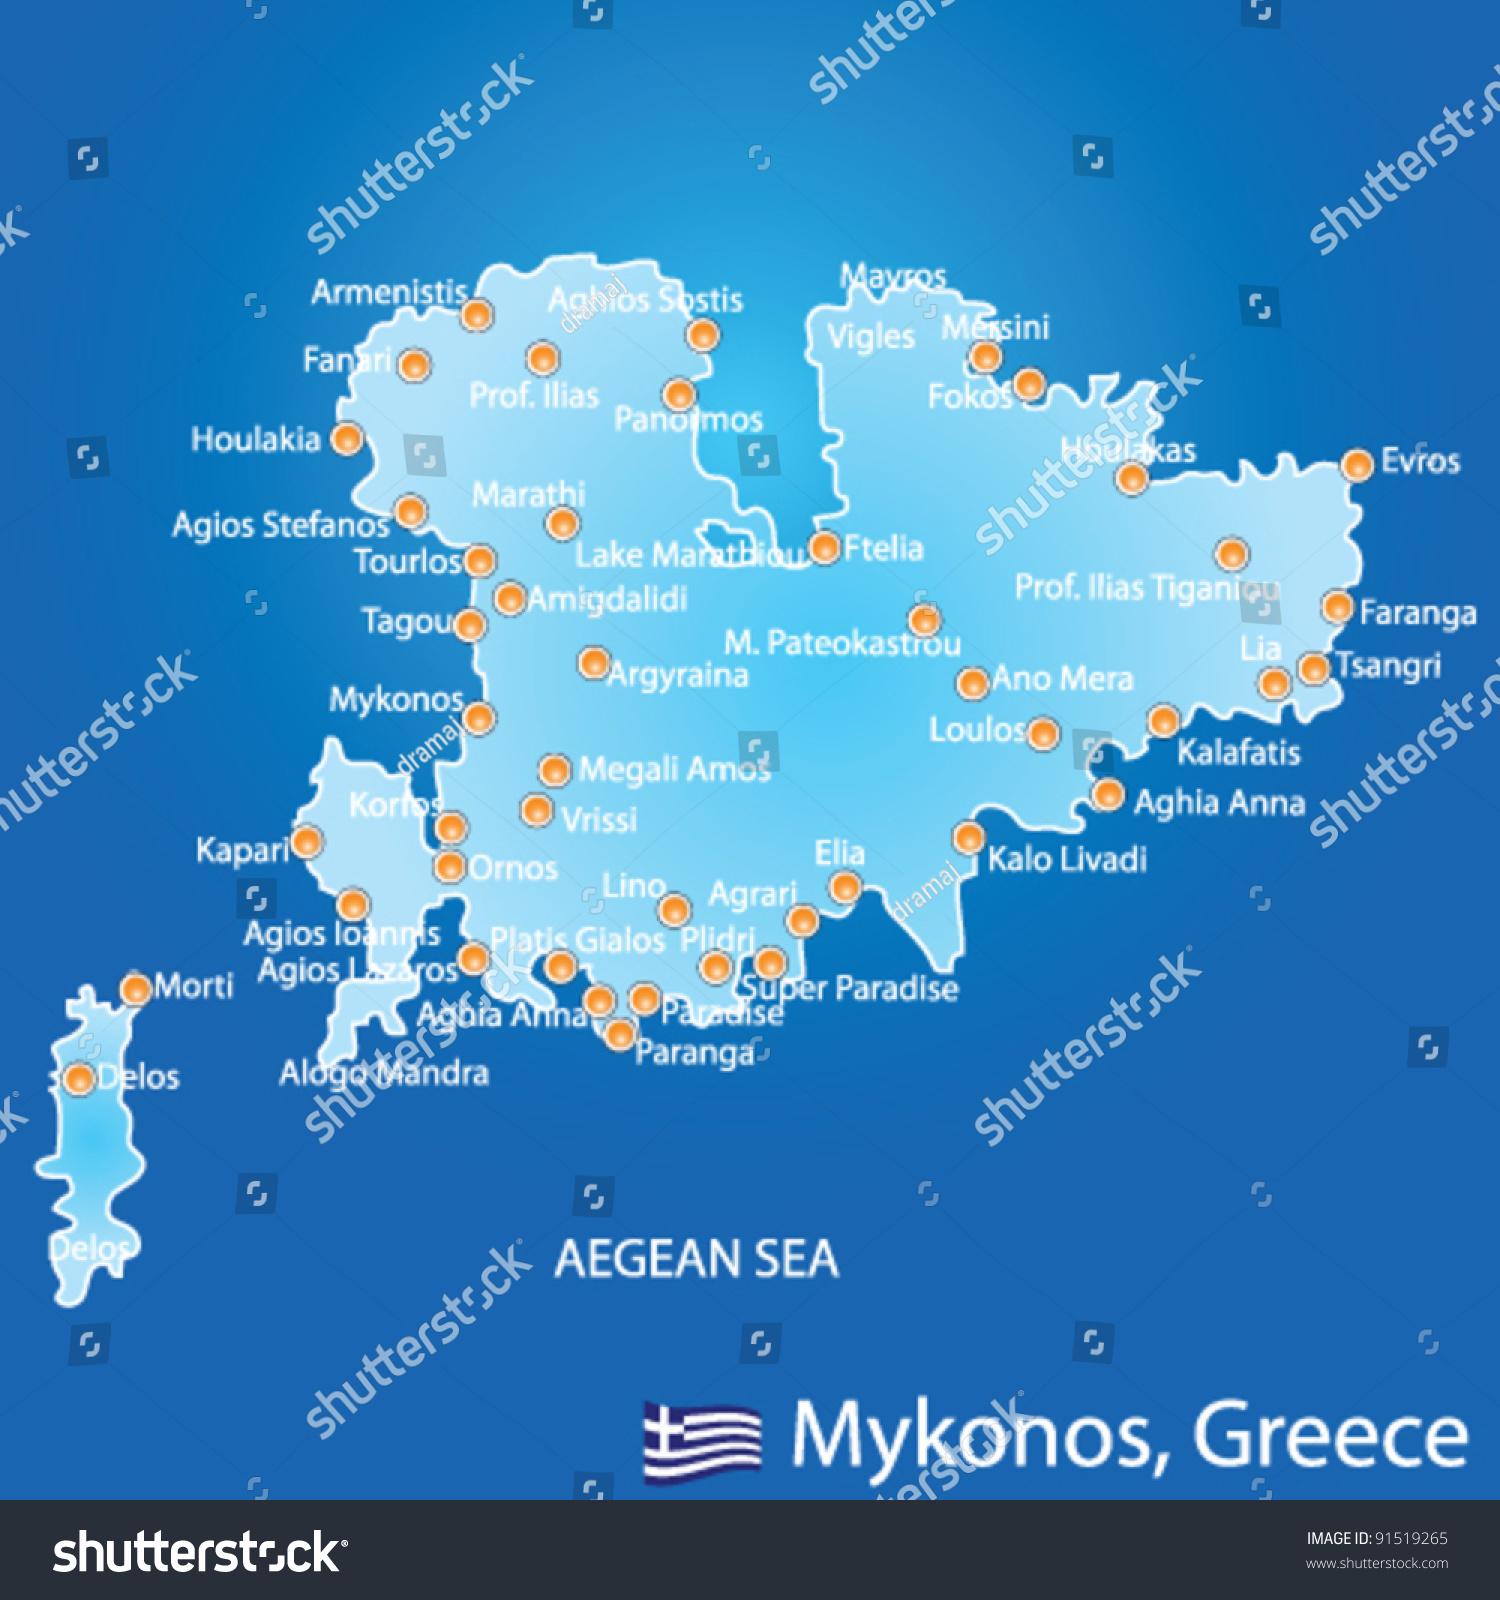 Free download greek island music